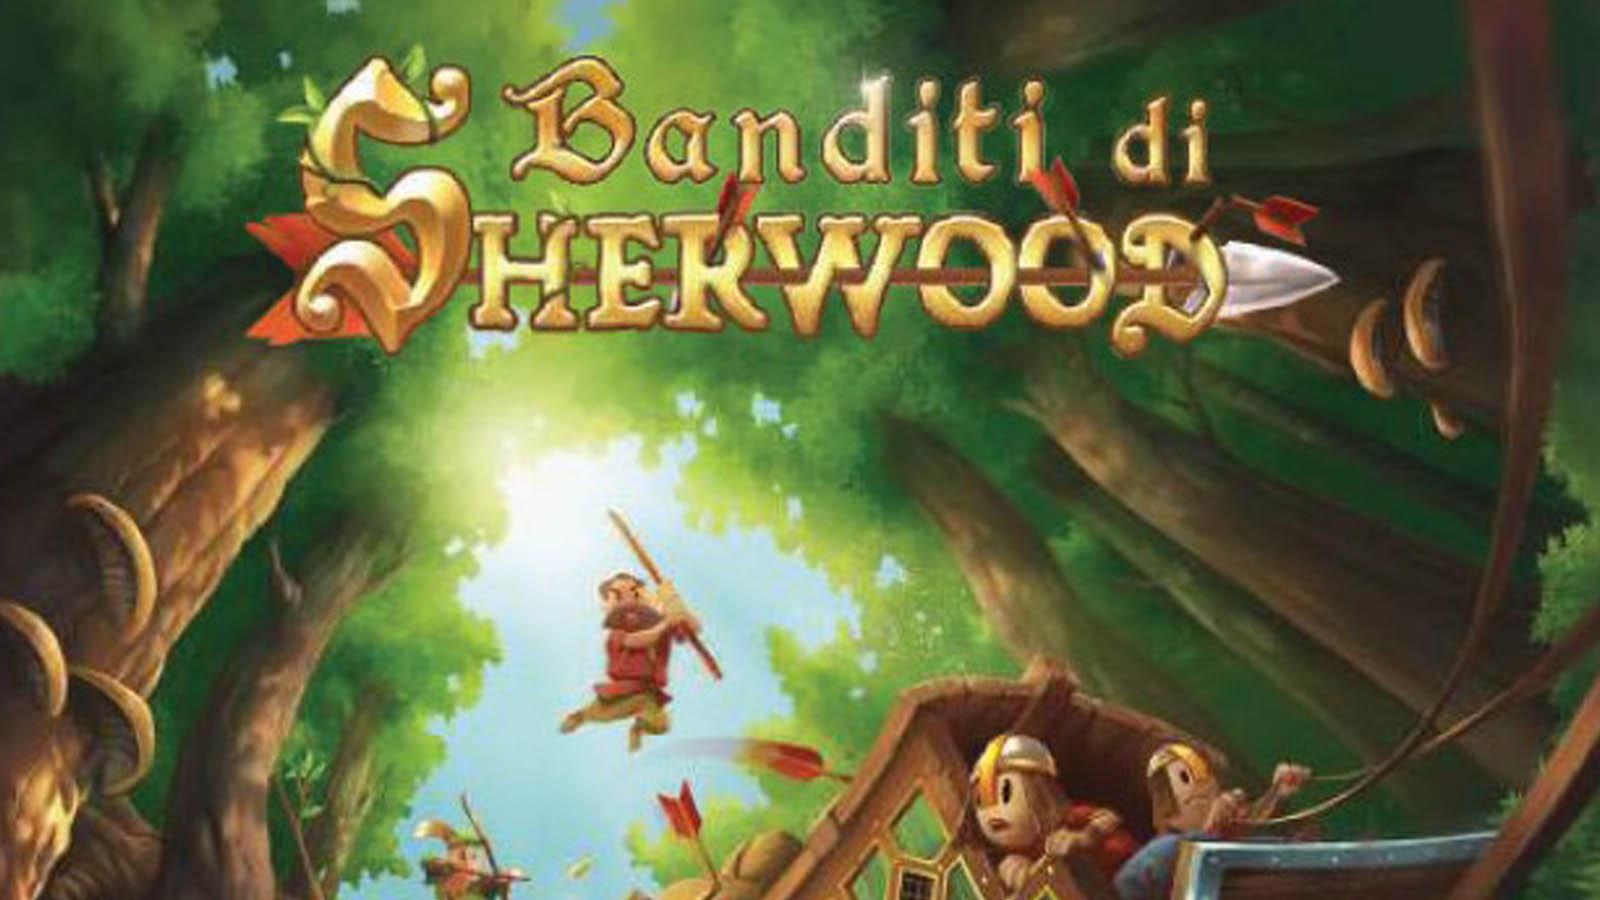 Banditi di Sherwood – Recensione